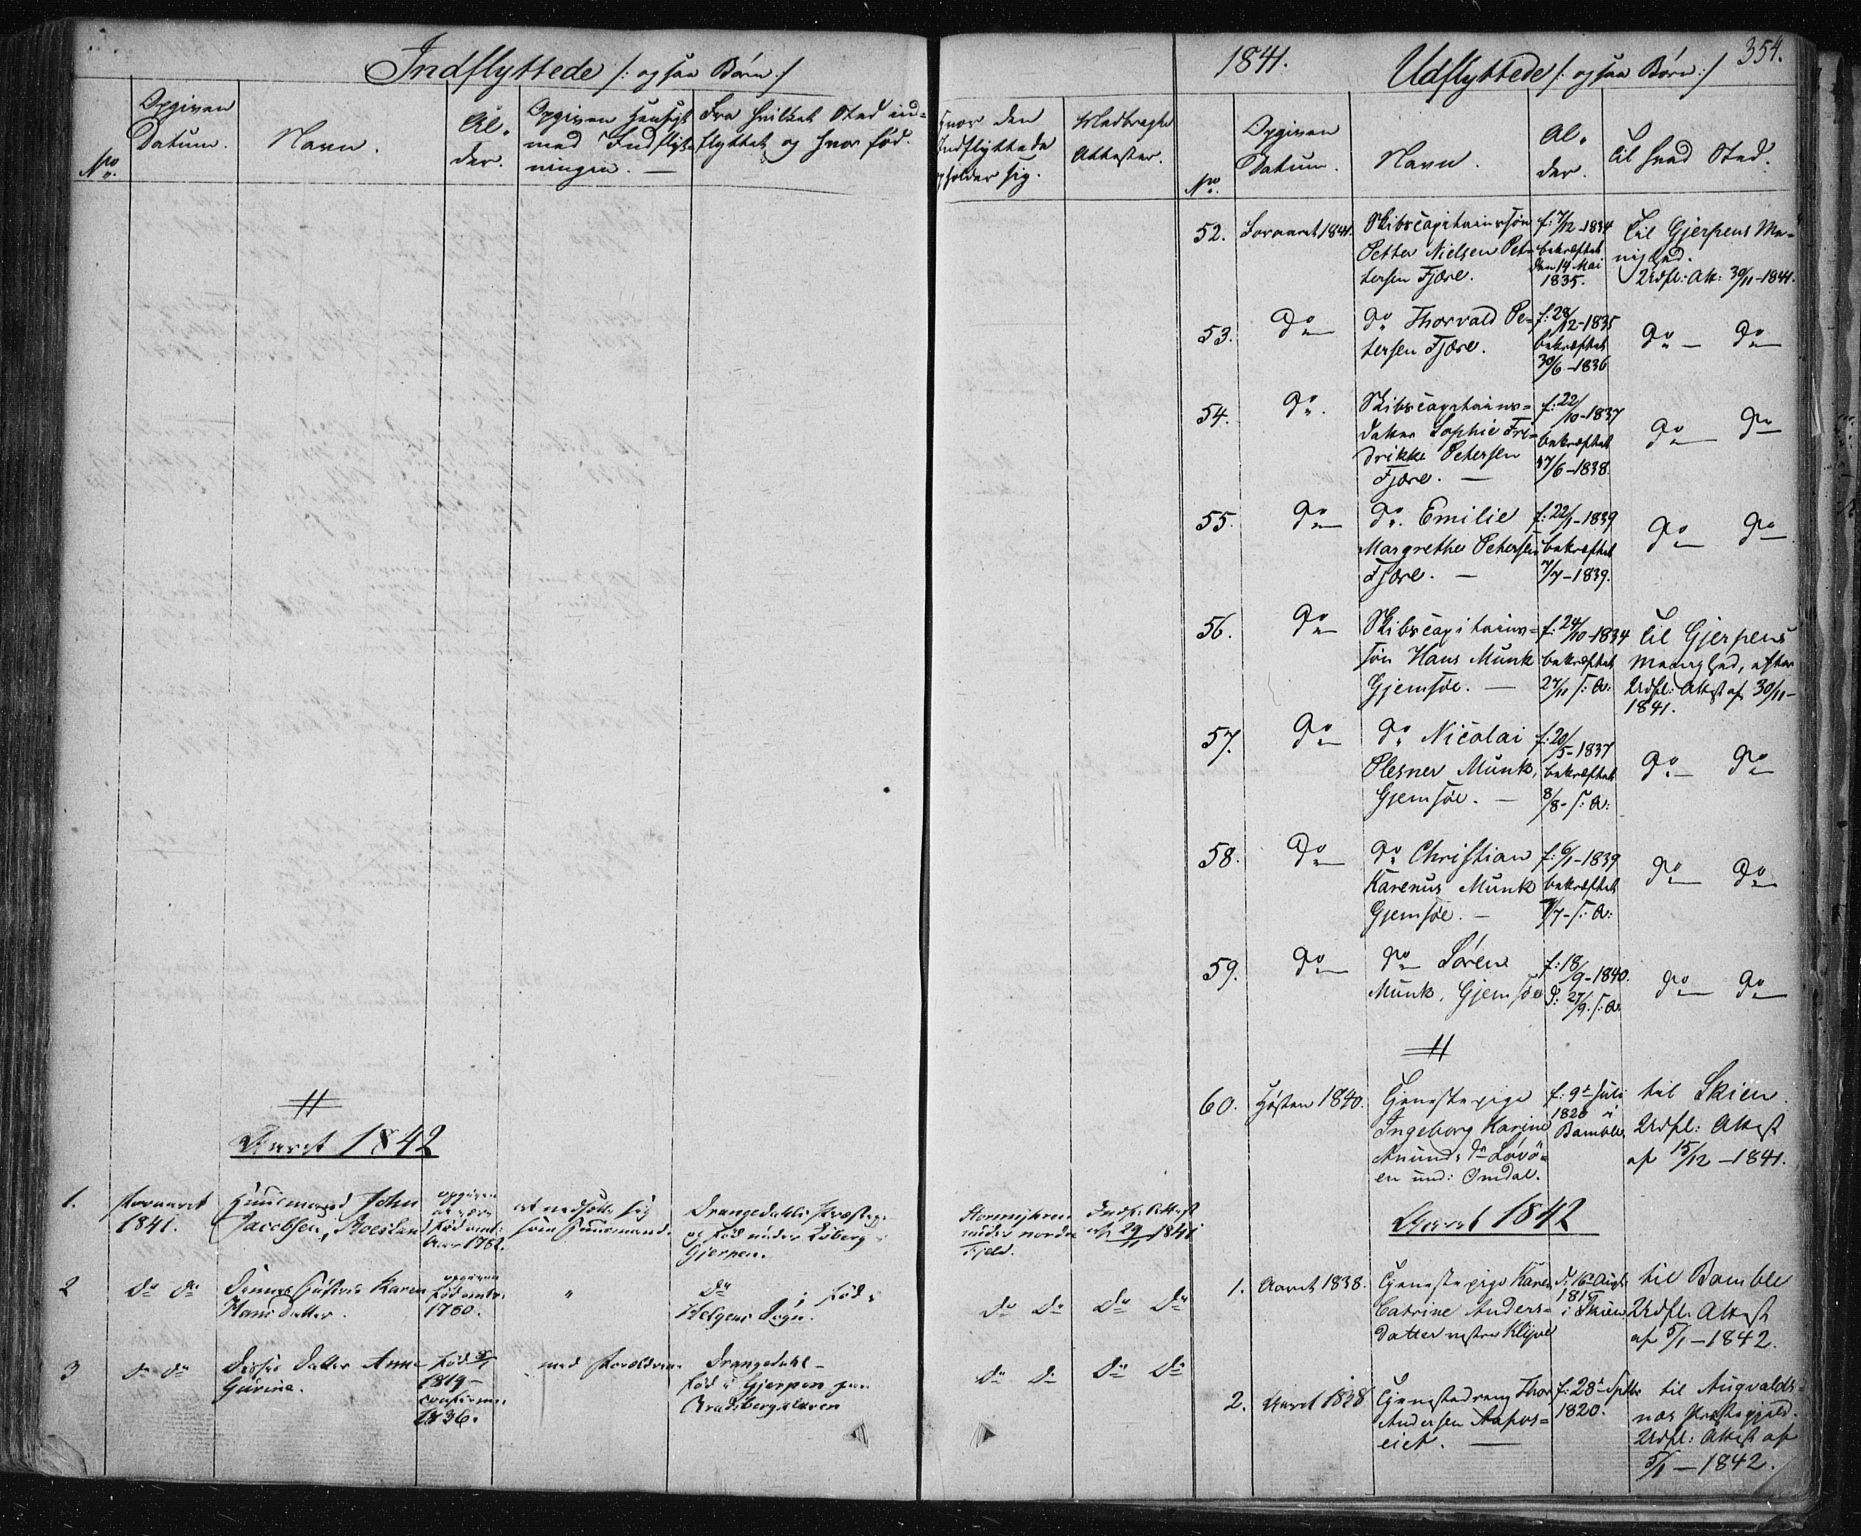 SAKO, Solum kirkebøker, F/Fa/L0005: Ministerialbok nr. I 5, 1833-1843, s. 354